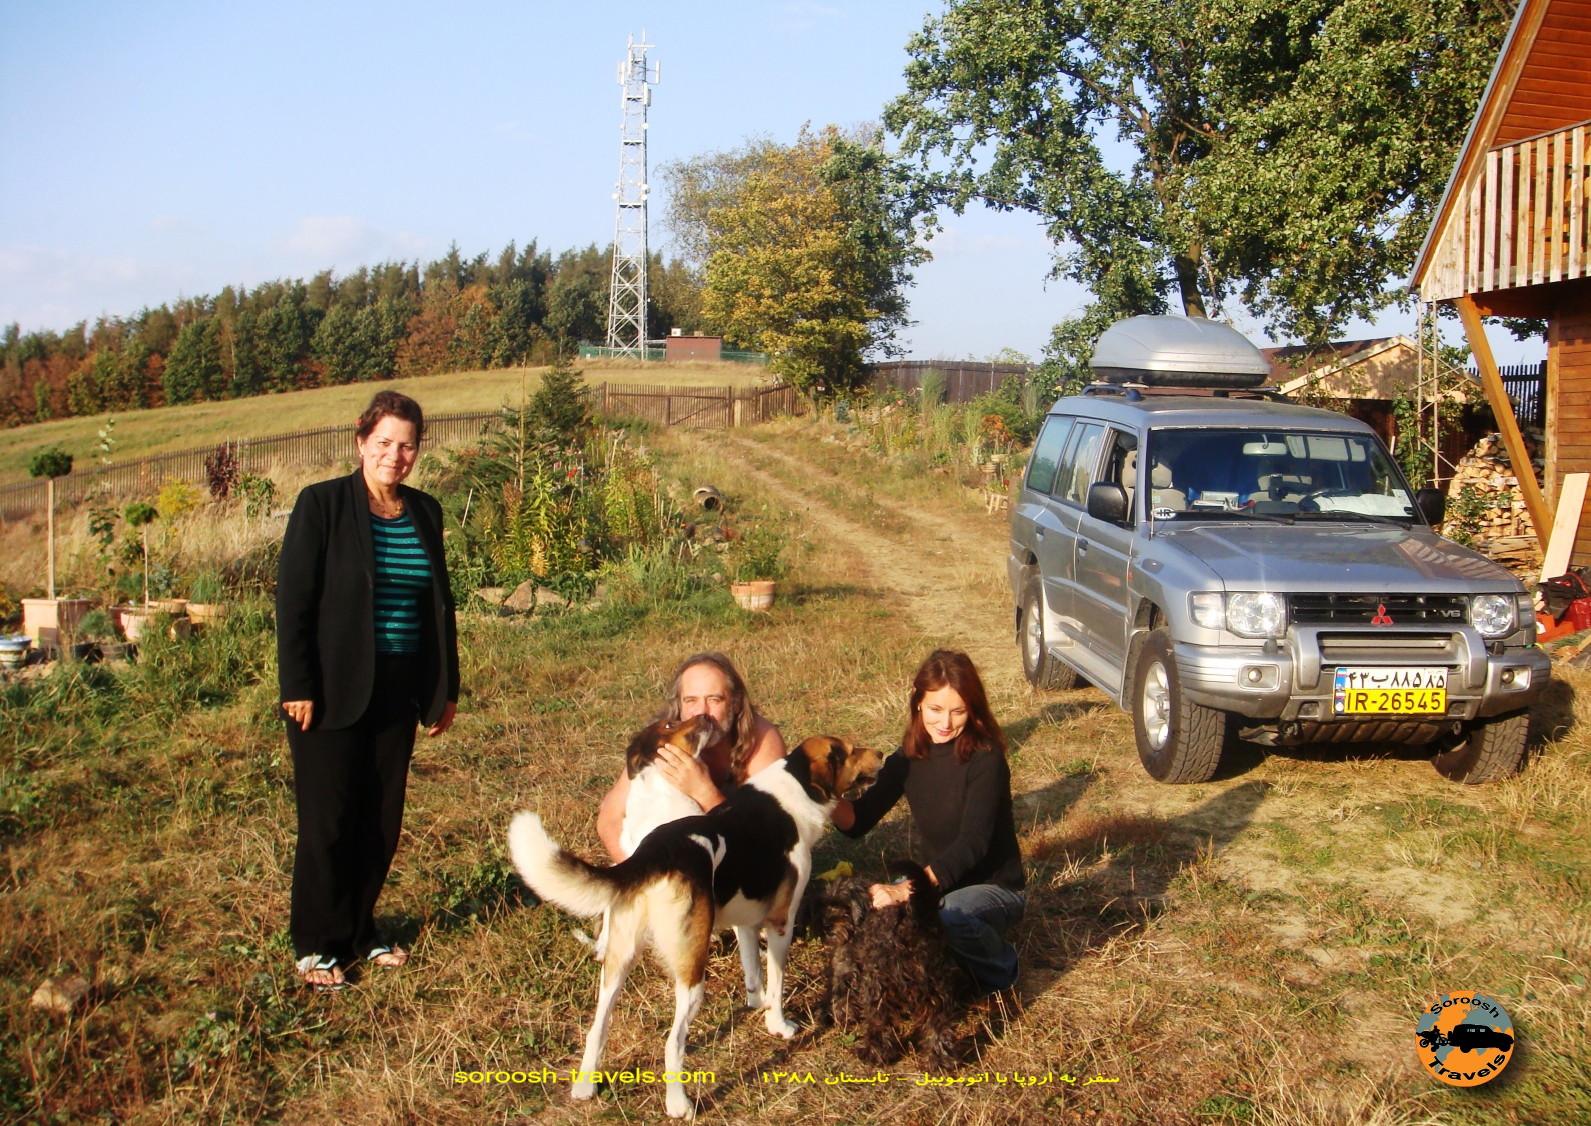 01-mehr-1388-23-september-2009-prague-24